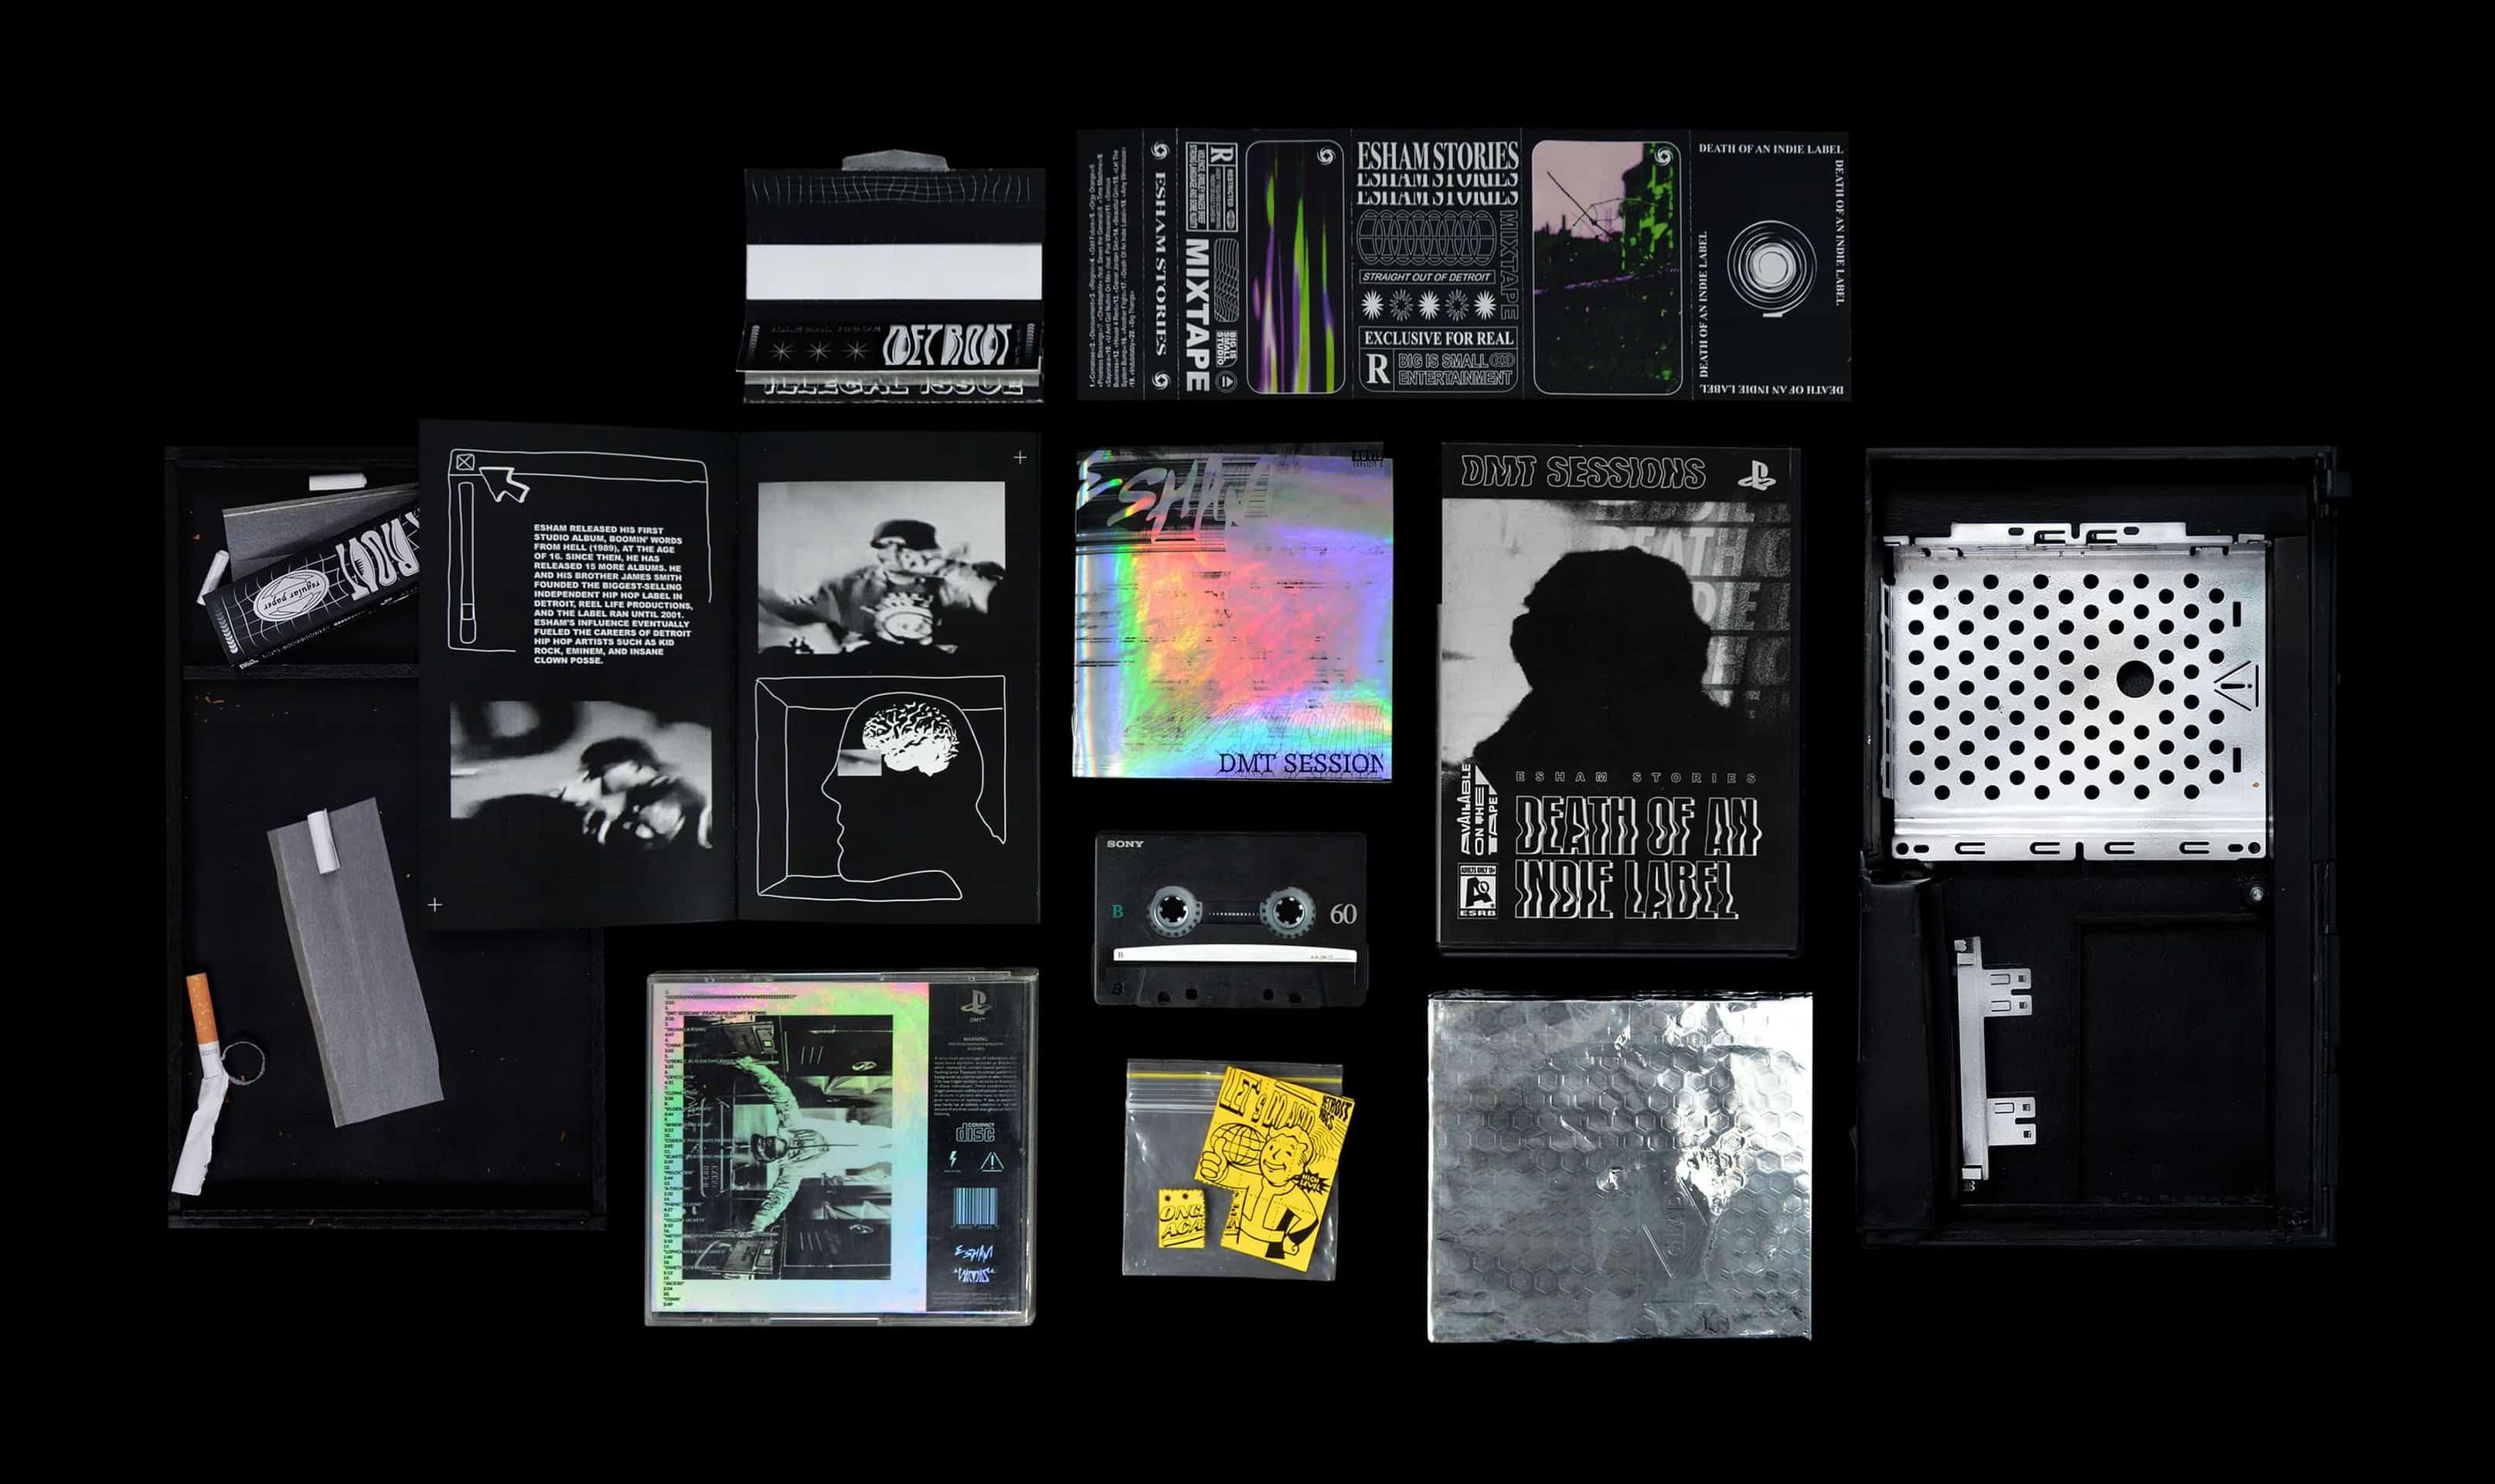 Esham - DMT Sessions (black market edition)